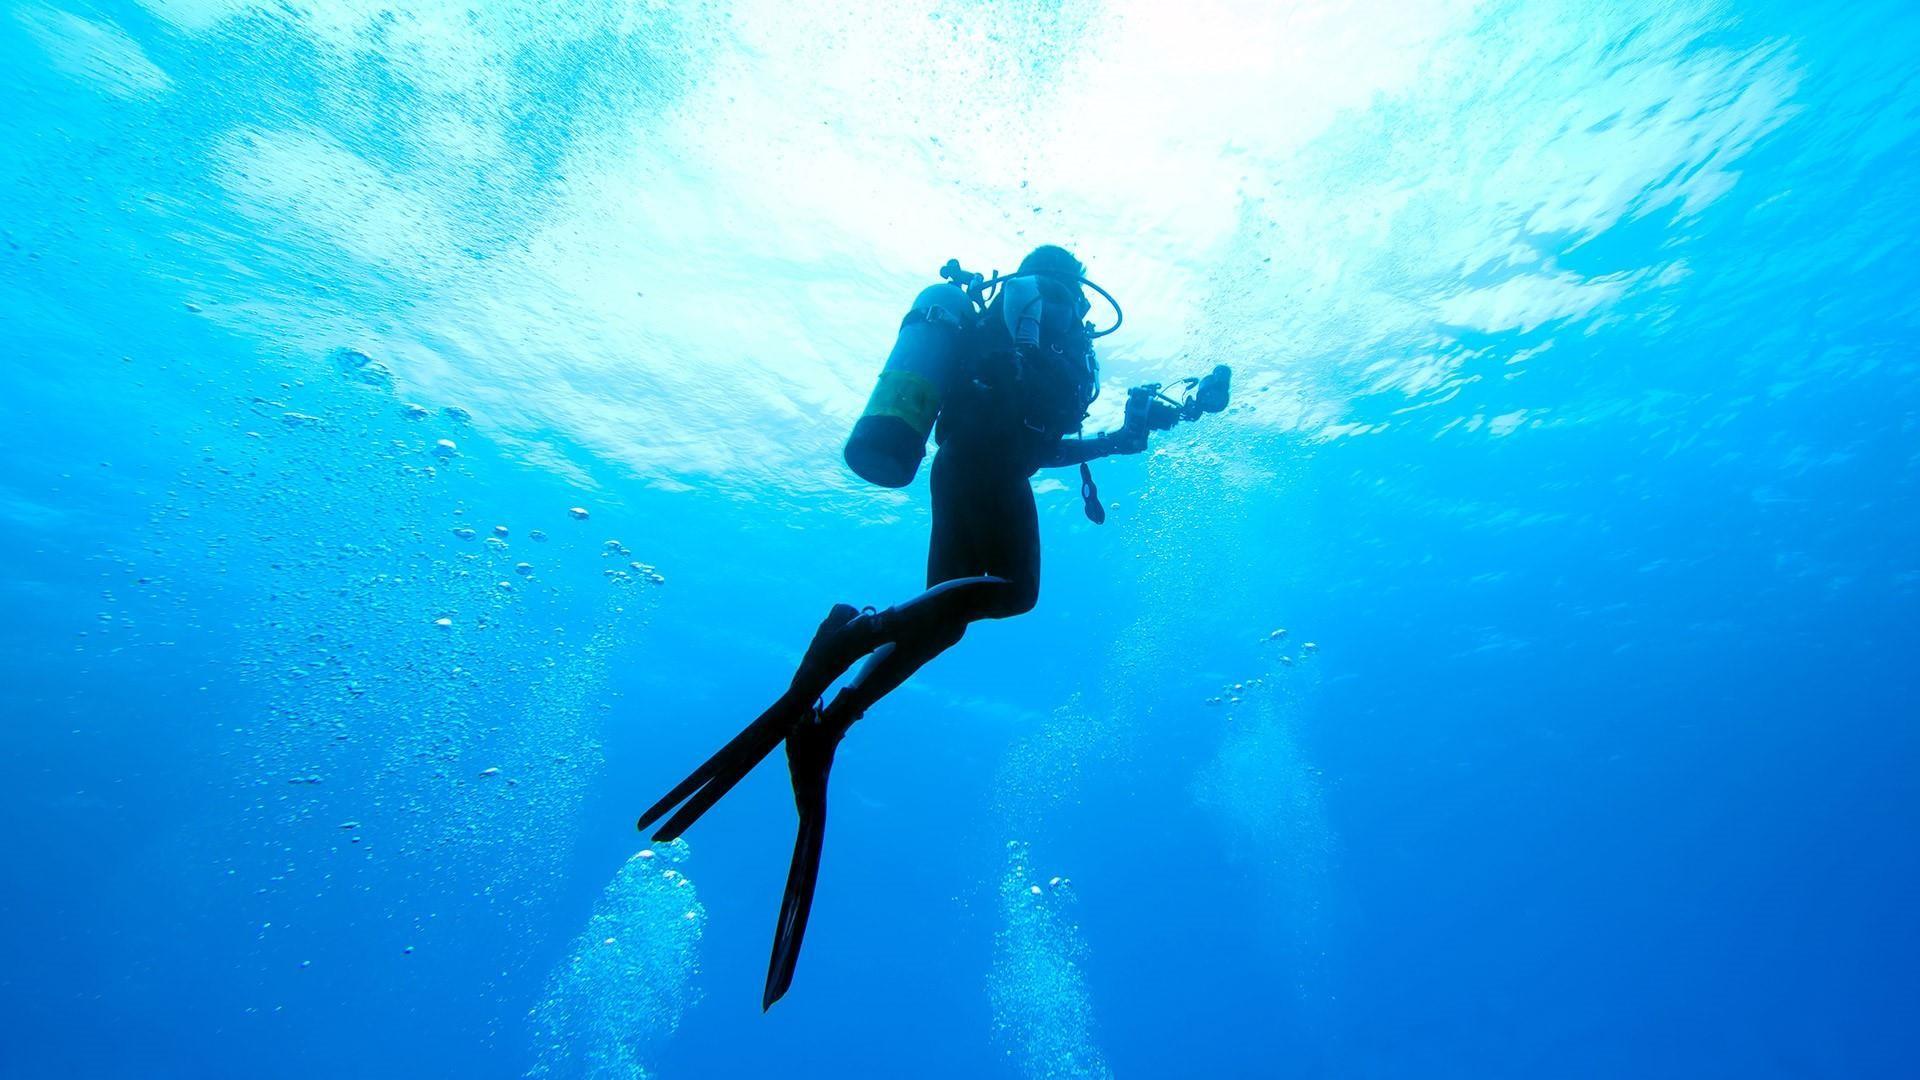 Scuba Diving Wallpaper (59+ Images